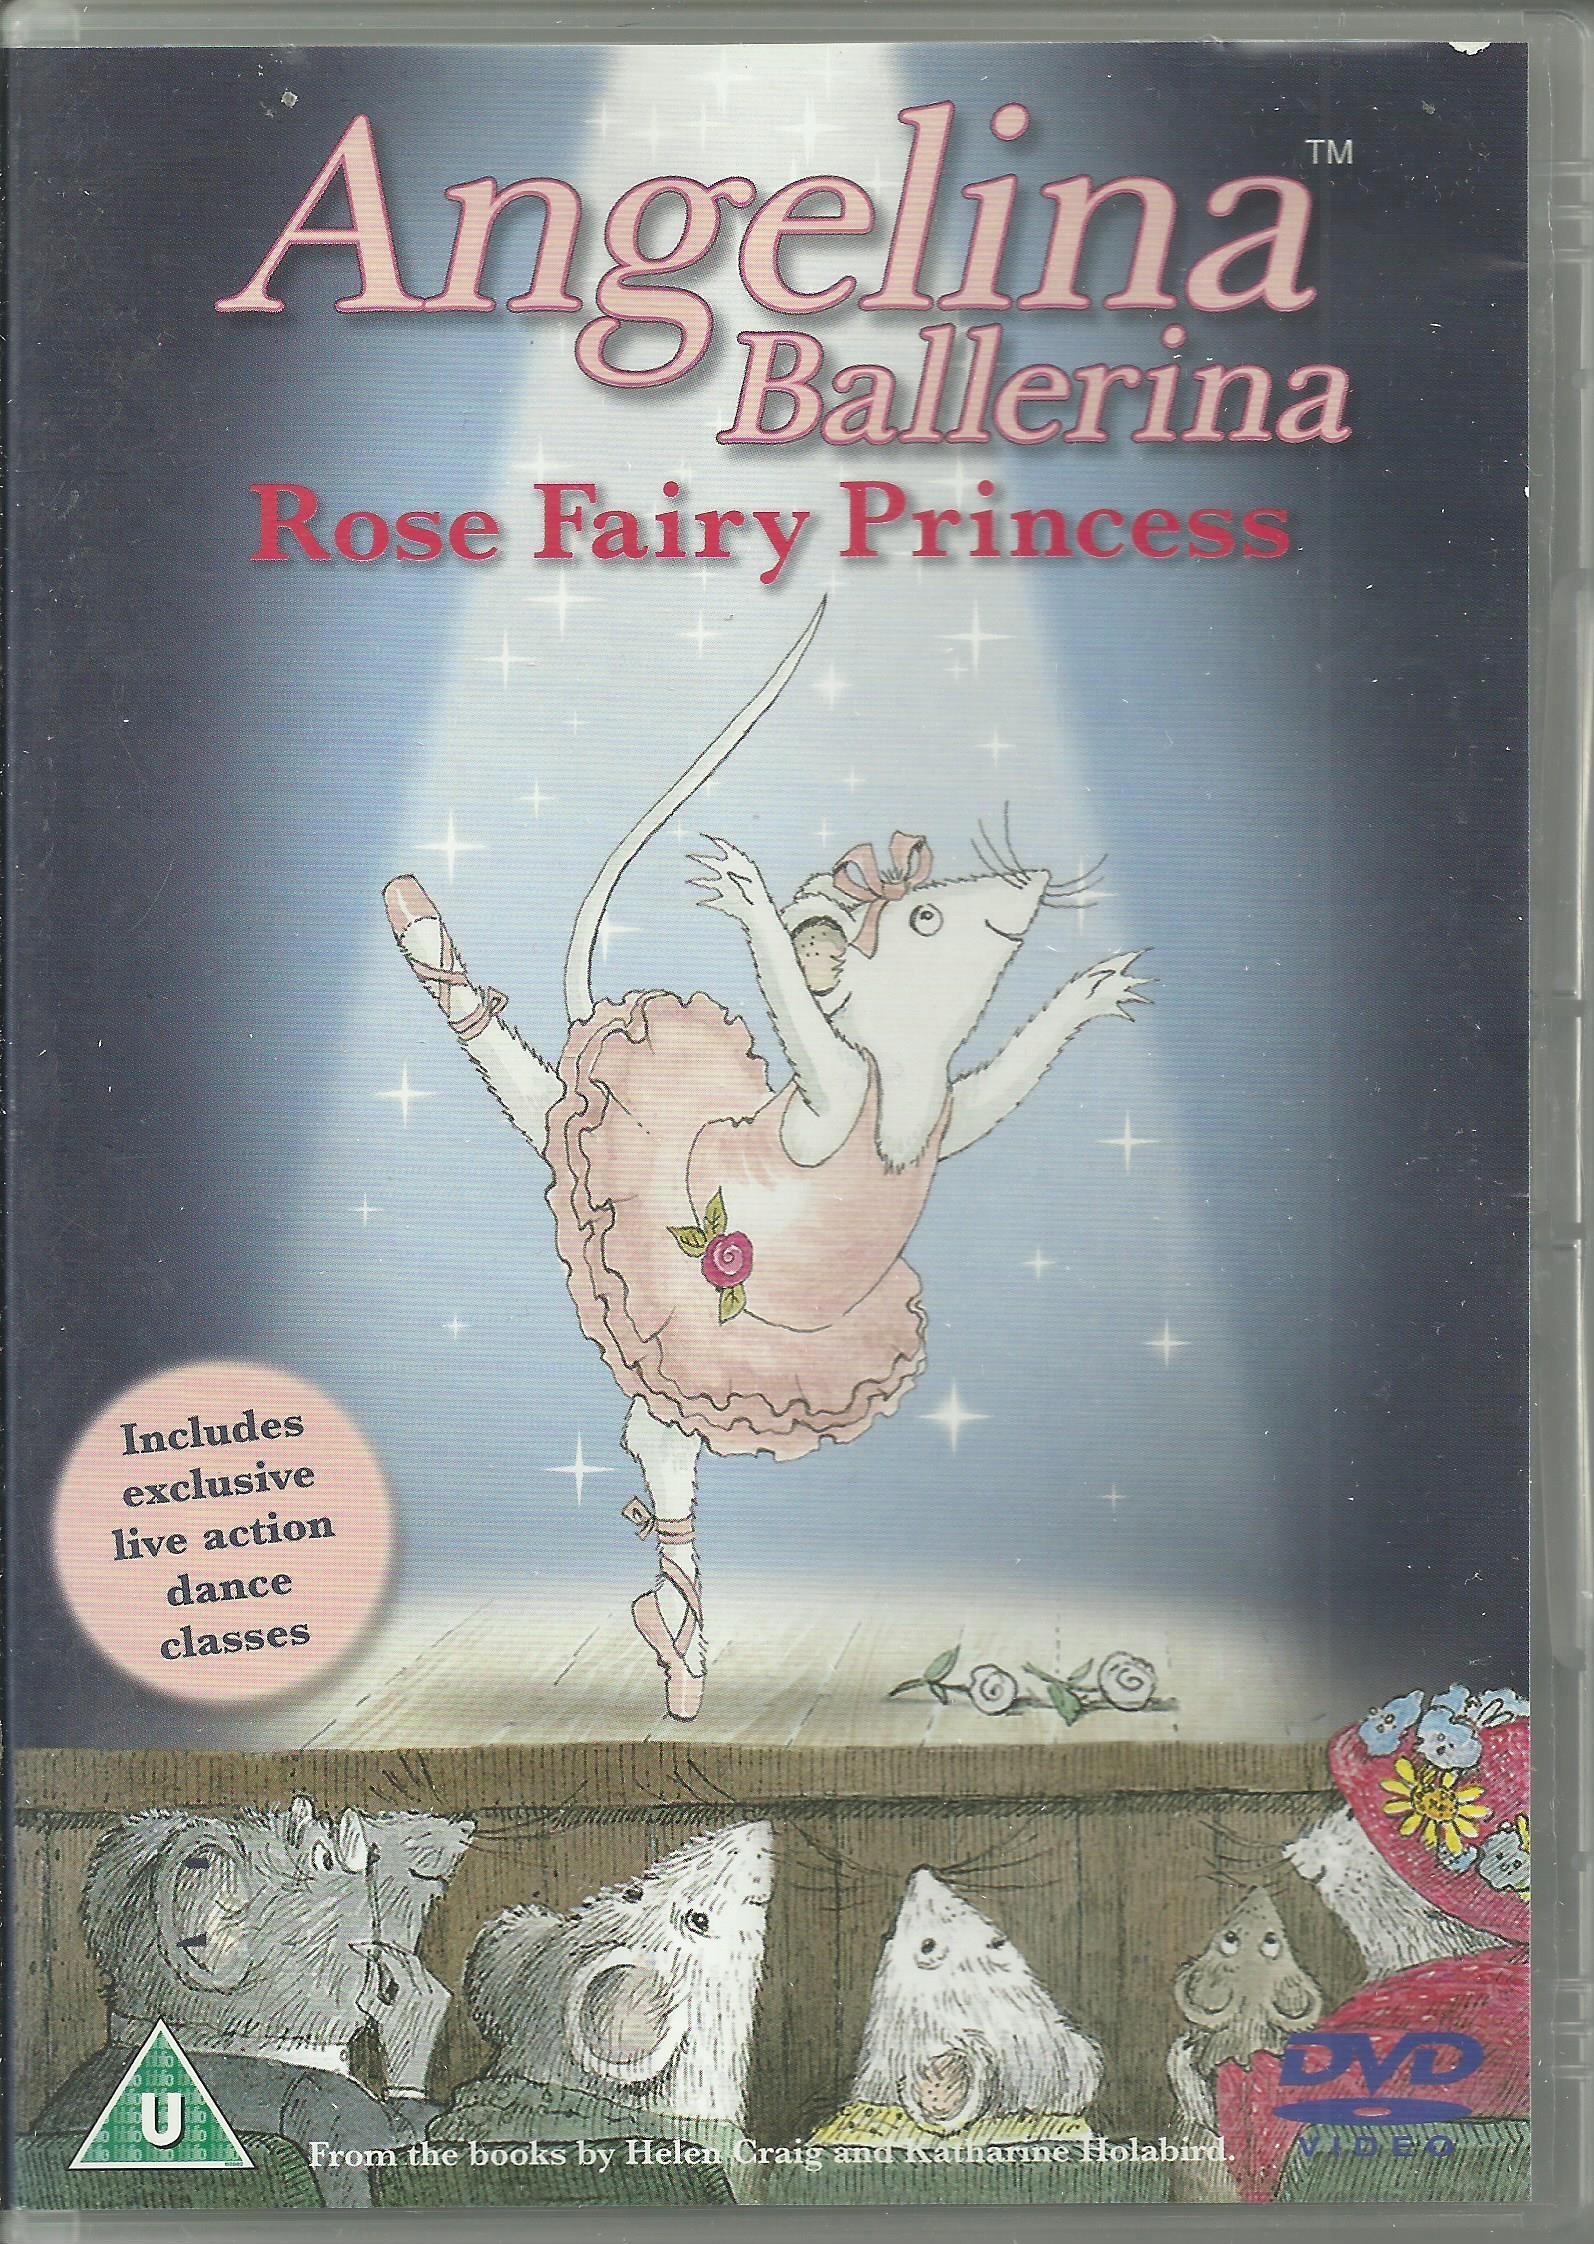 Angelina Ballerina Rose Fairy Princess - DVD